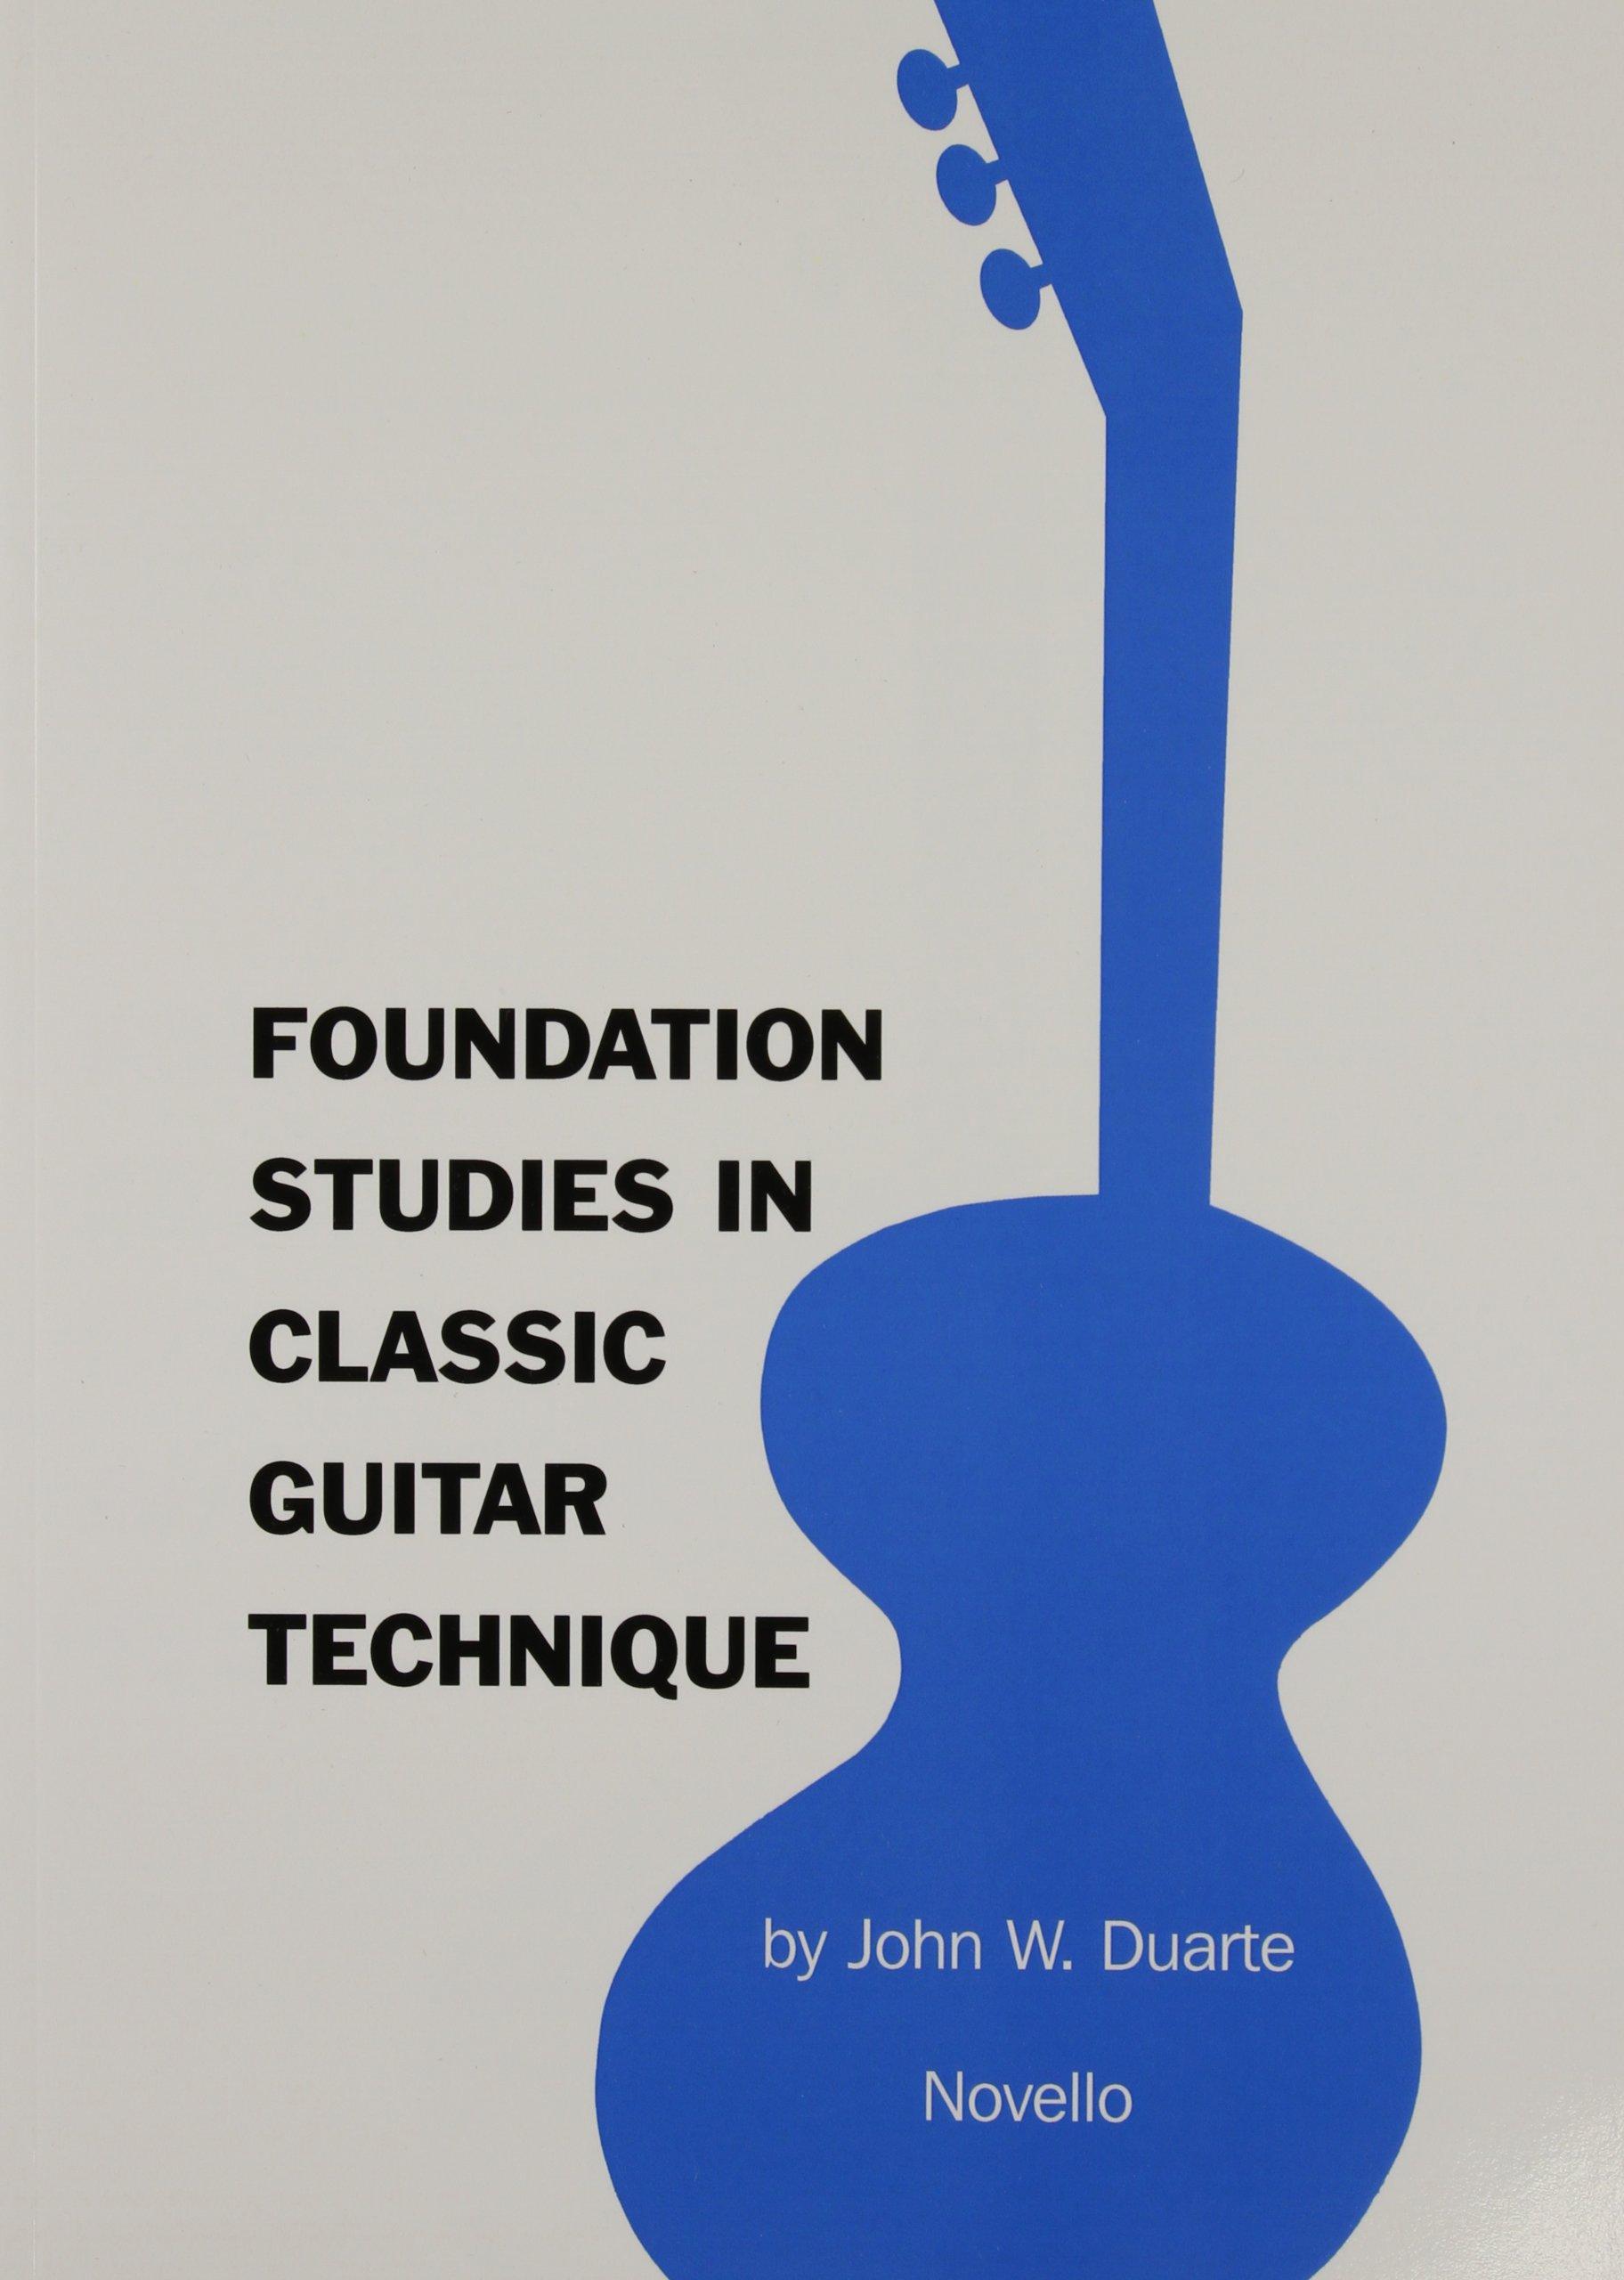 FOUNDATION STUDIES/CLASSIC GT GUITAR